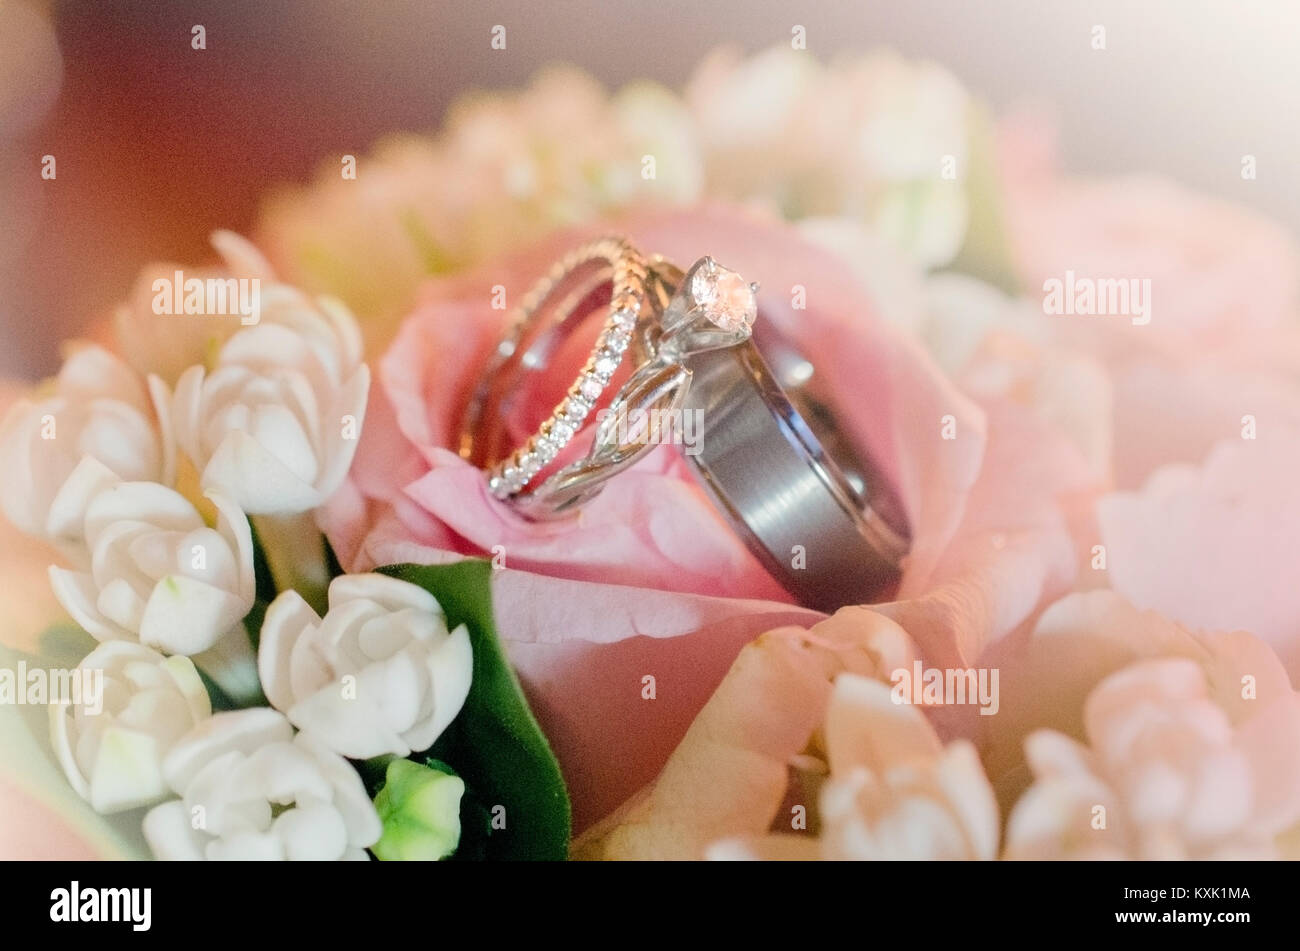 wedding rings on brides bouquet Stock Photo: 171292810 - Alamy